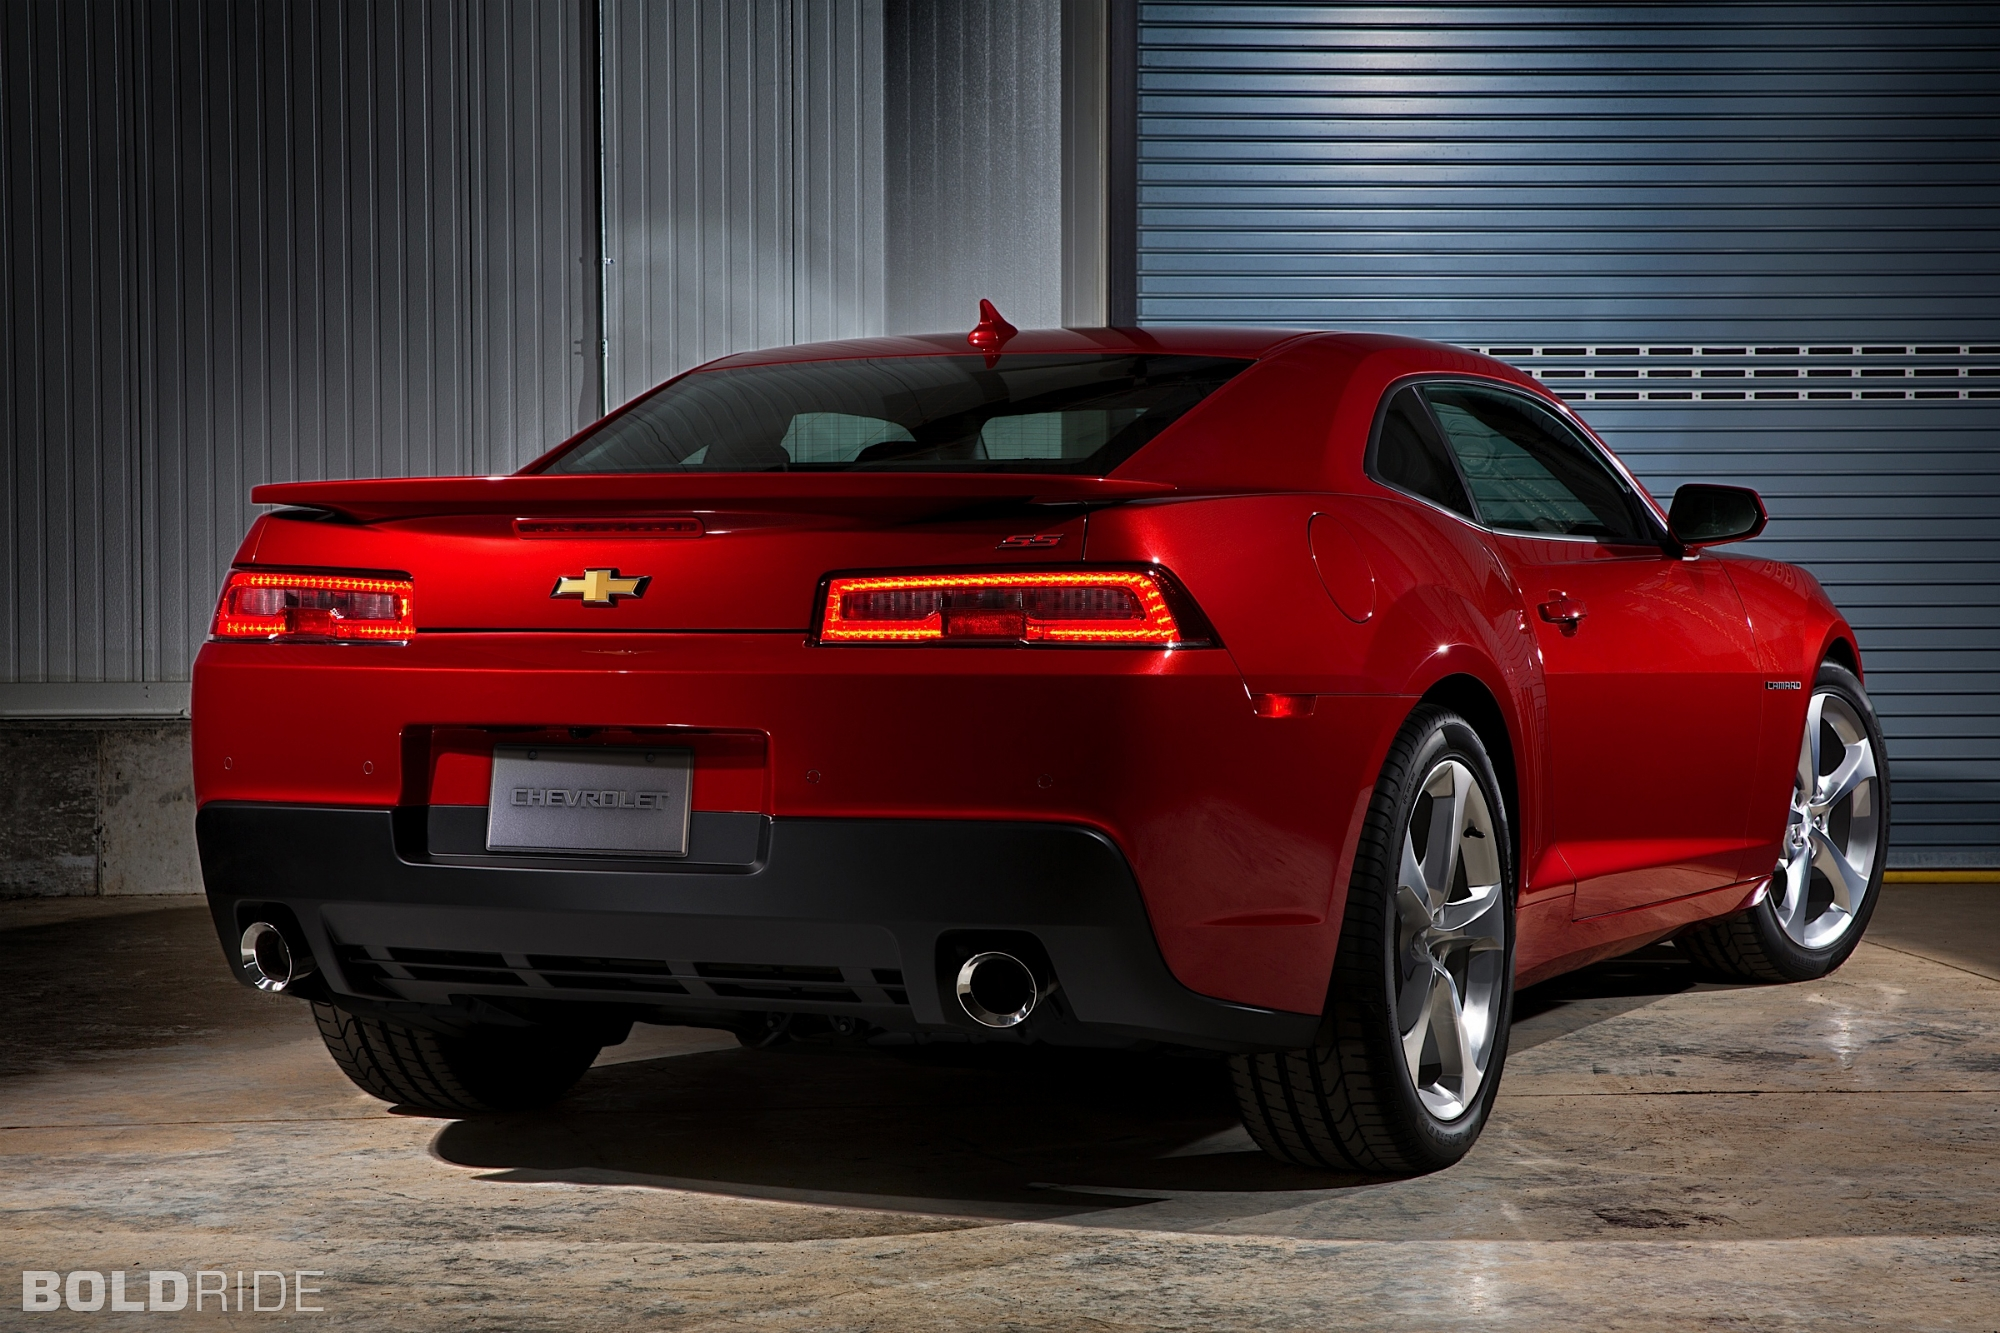 2014 Chevrolet Camaro SS muscle cars car t wallpaper | 2000x1333 ...